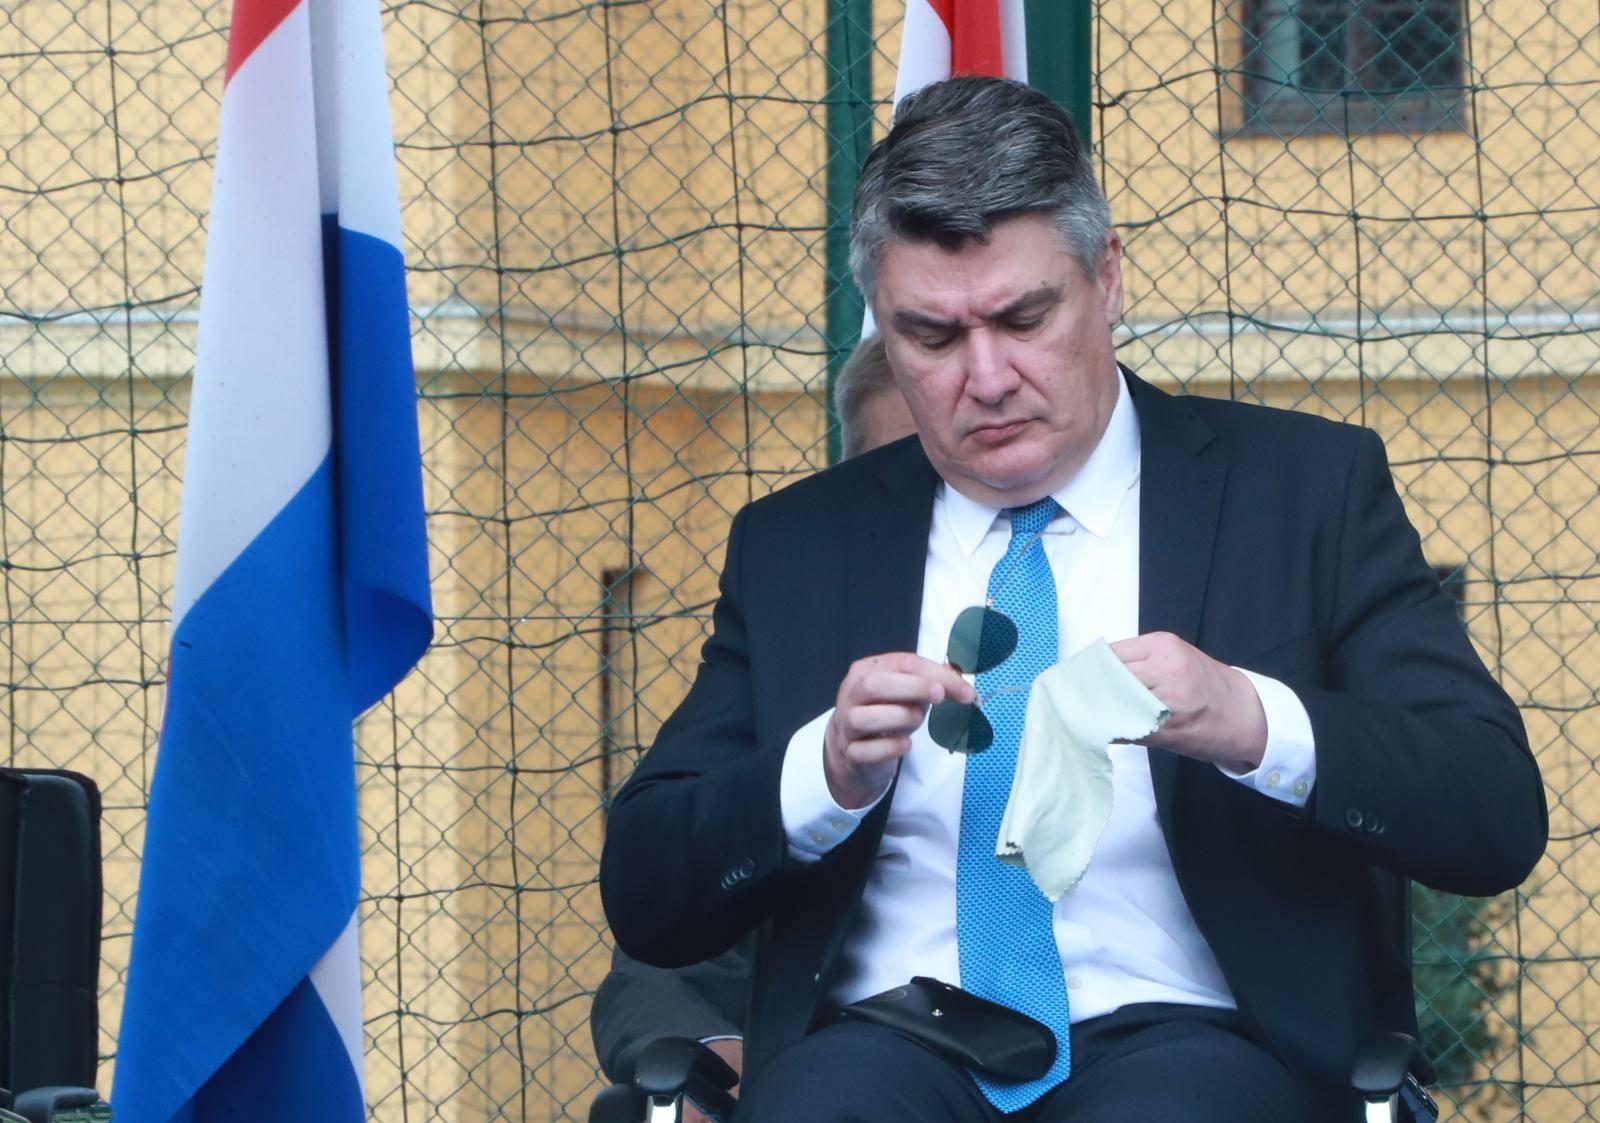 Zagreb: Predsjednik Milanović dobro očistio naočale prije promocije časnika